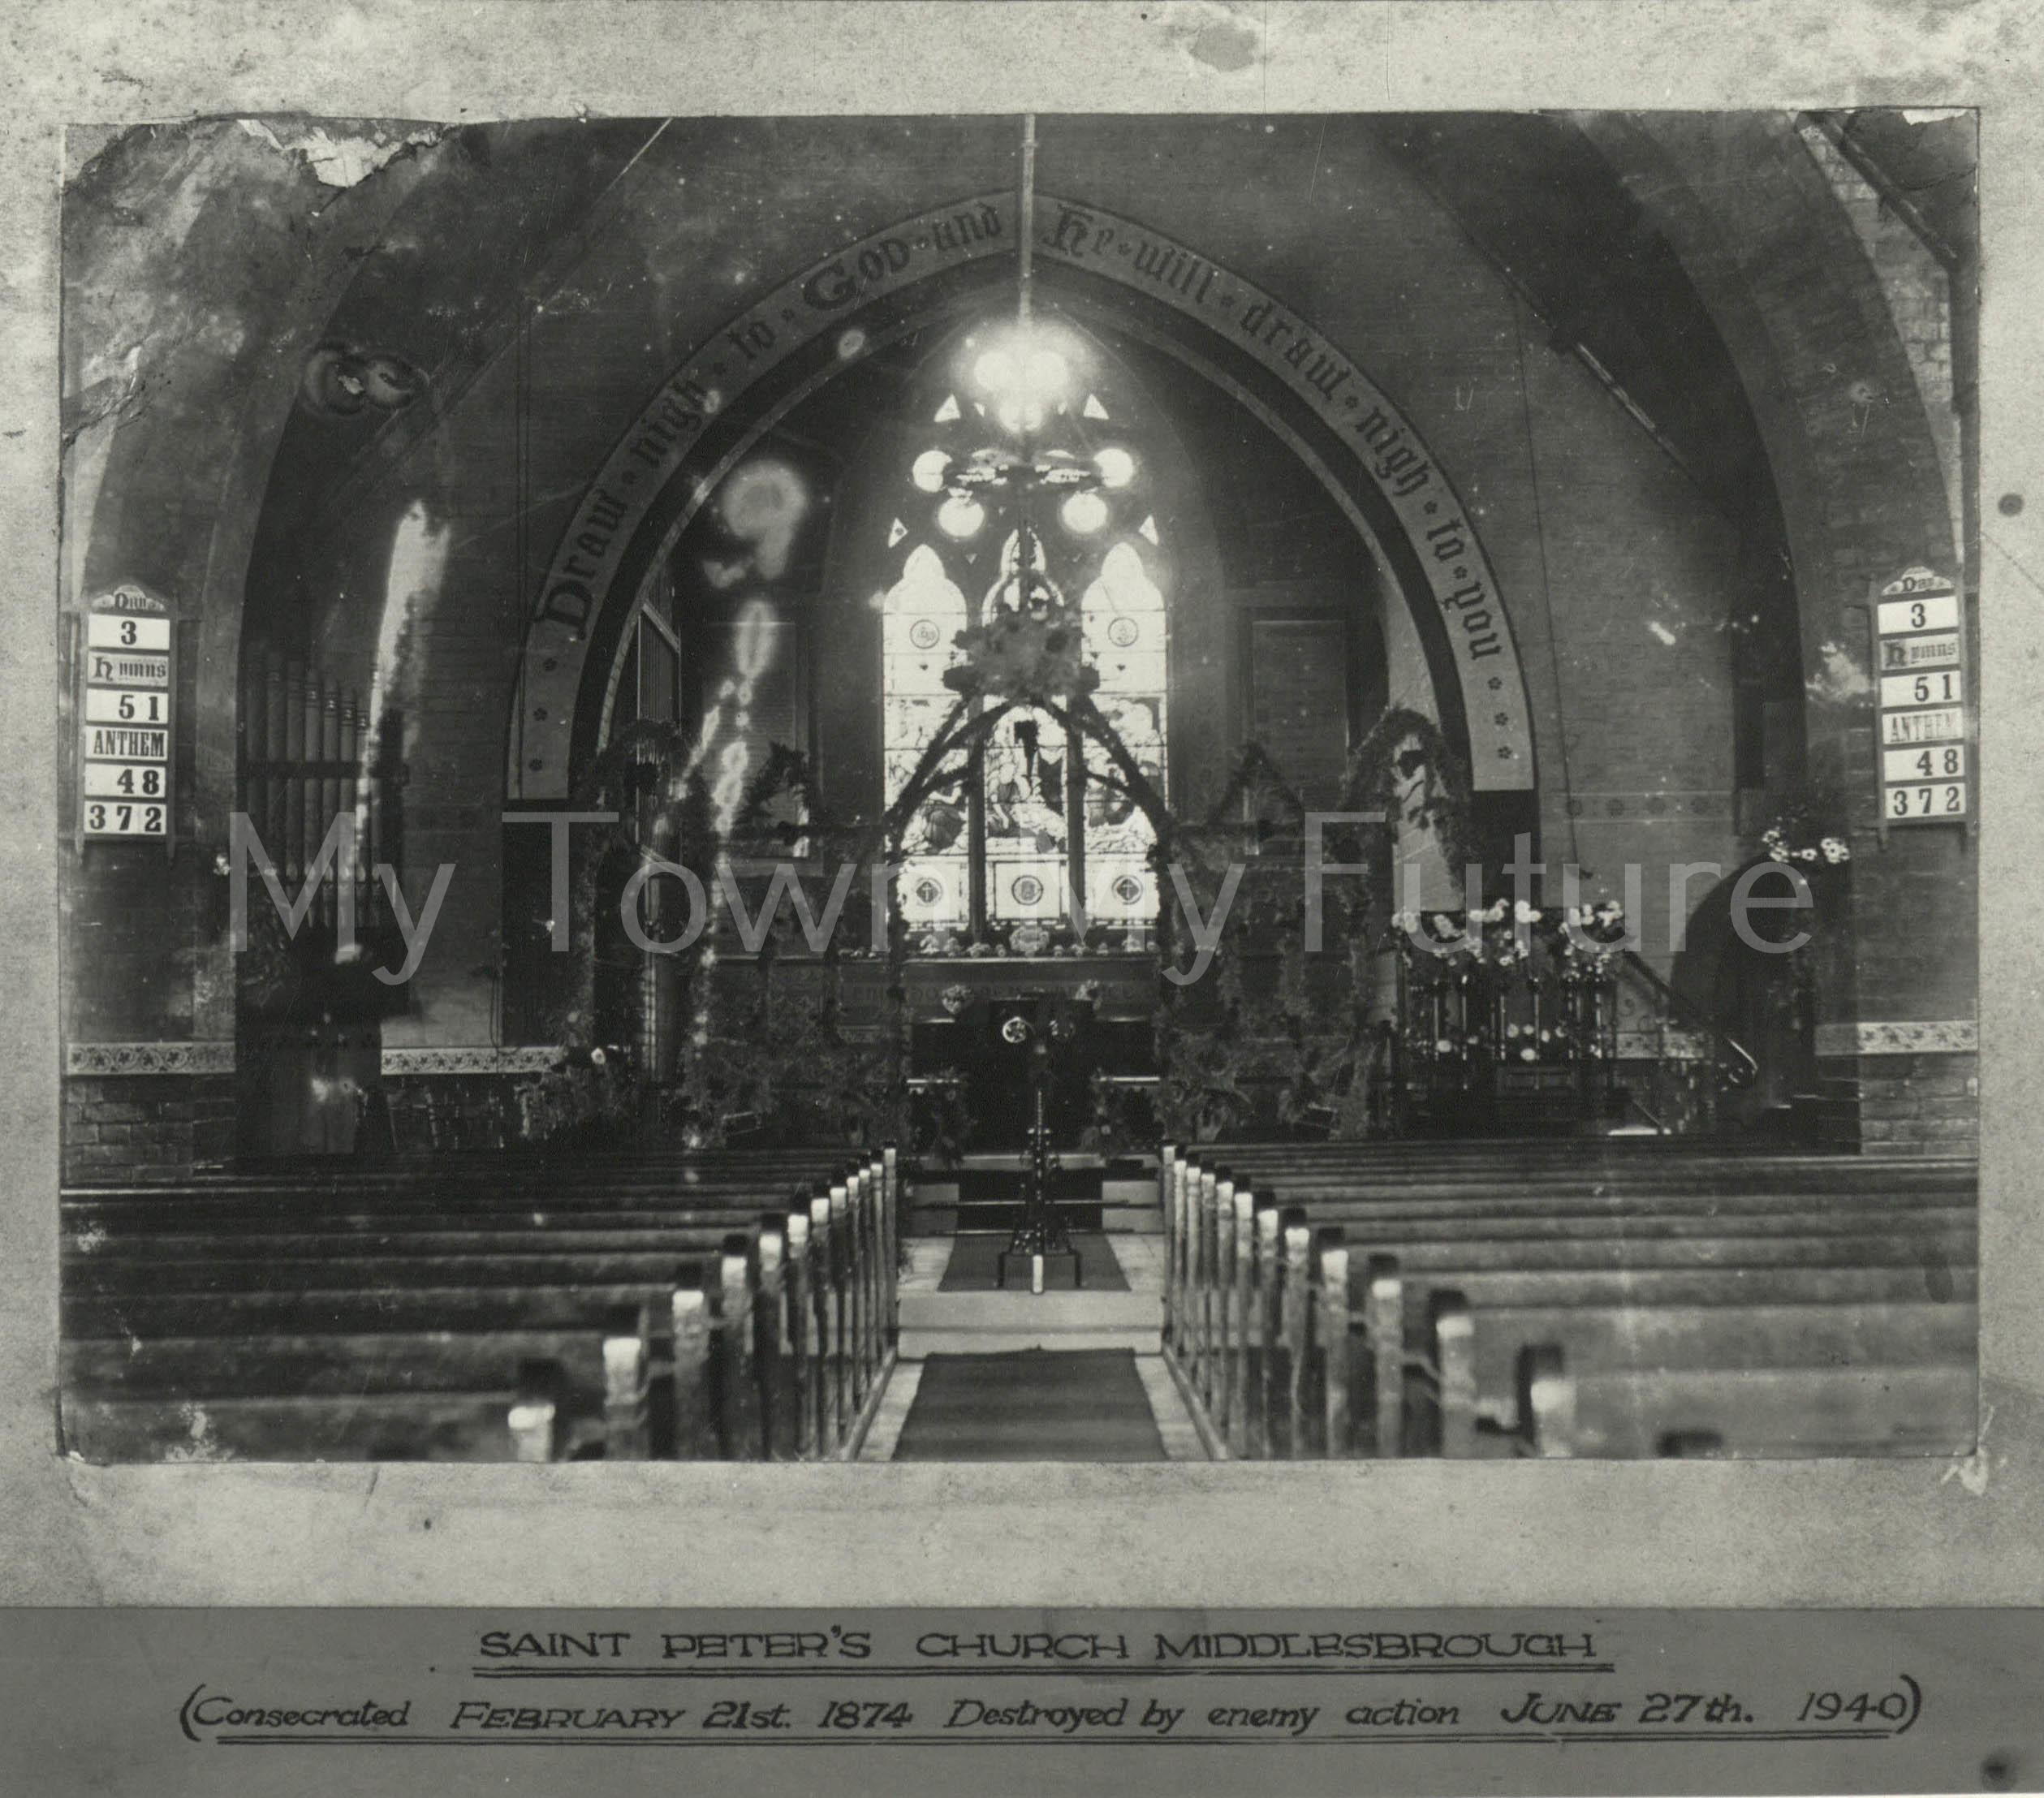 St Peter's Church, 1940